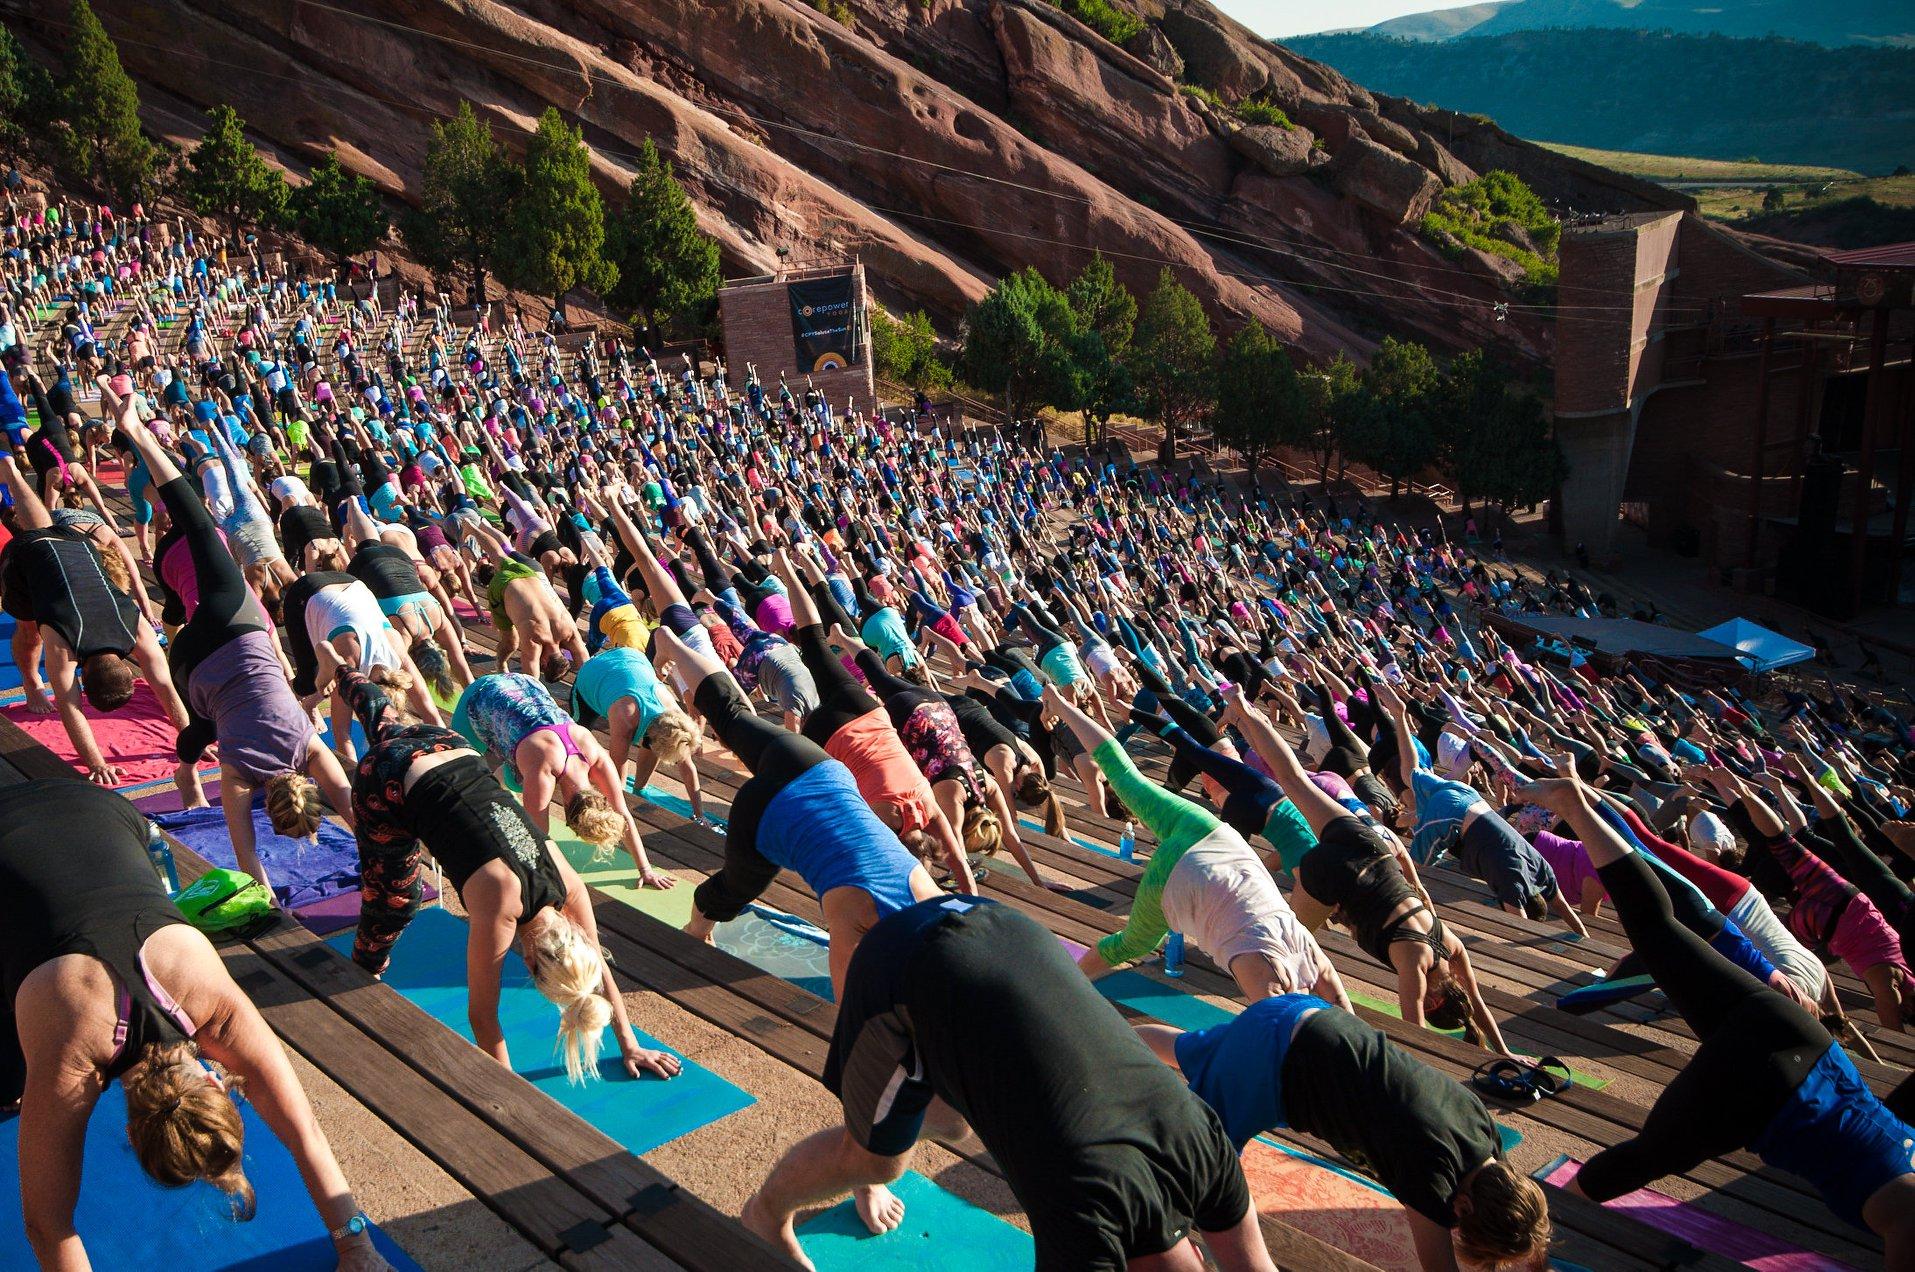 yoga on the rocks